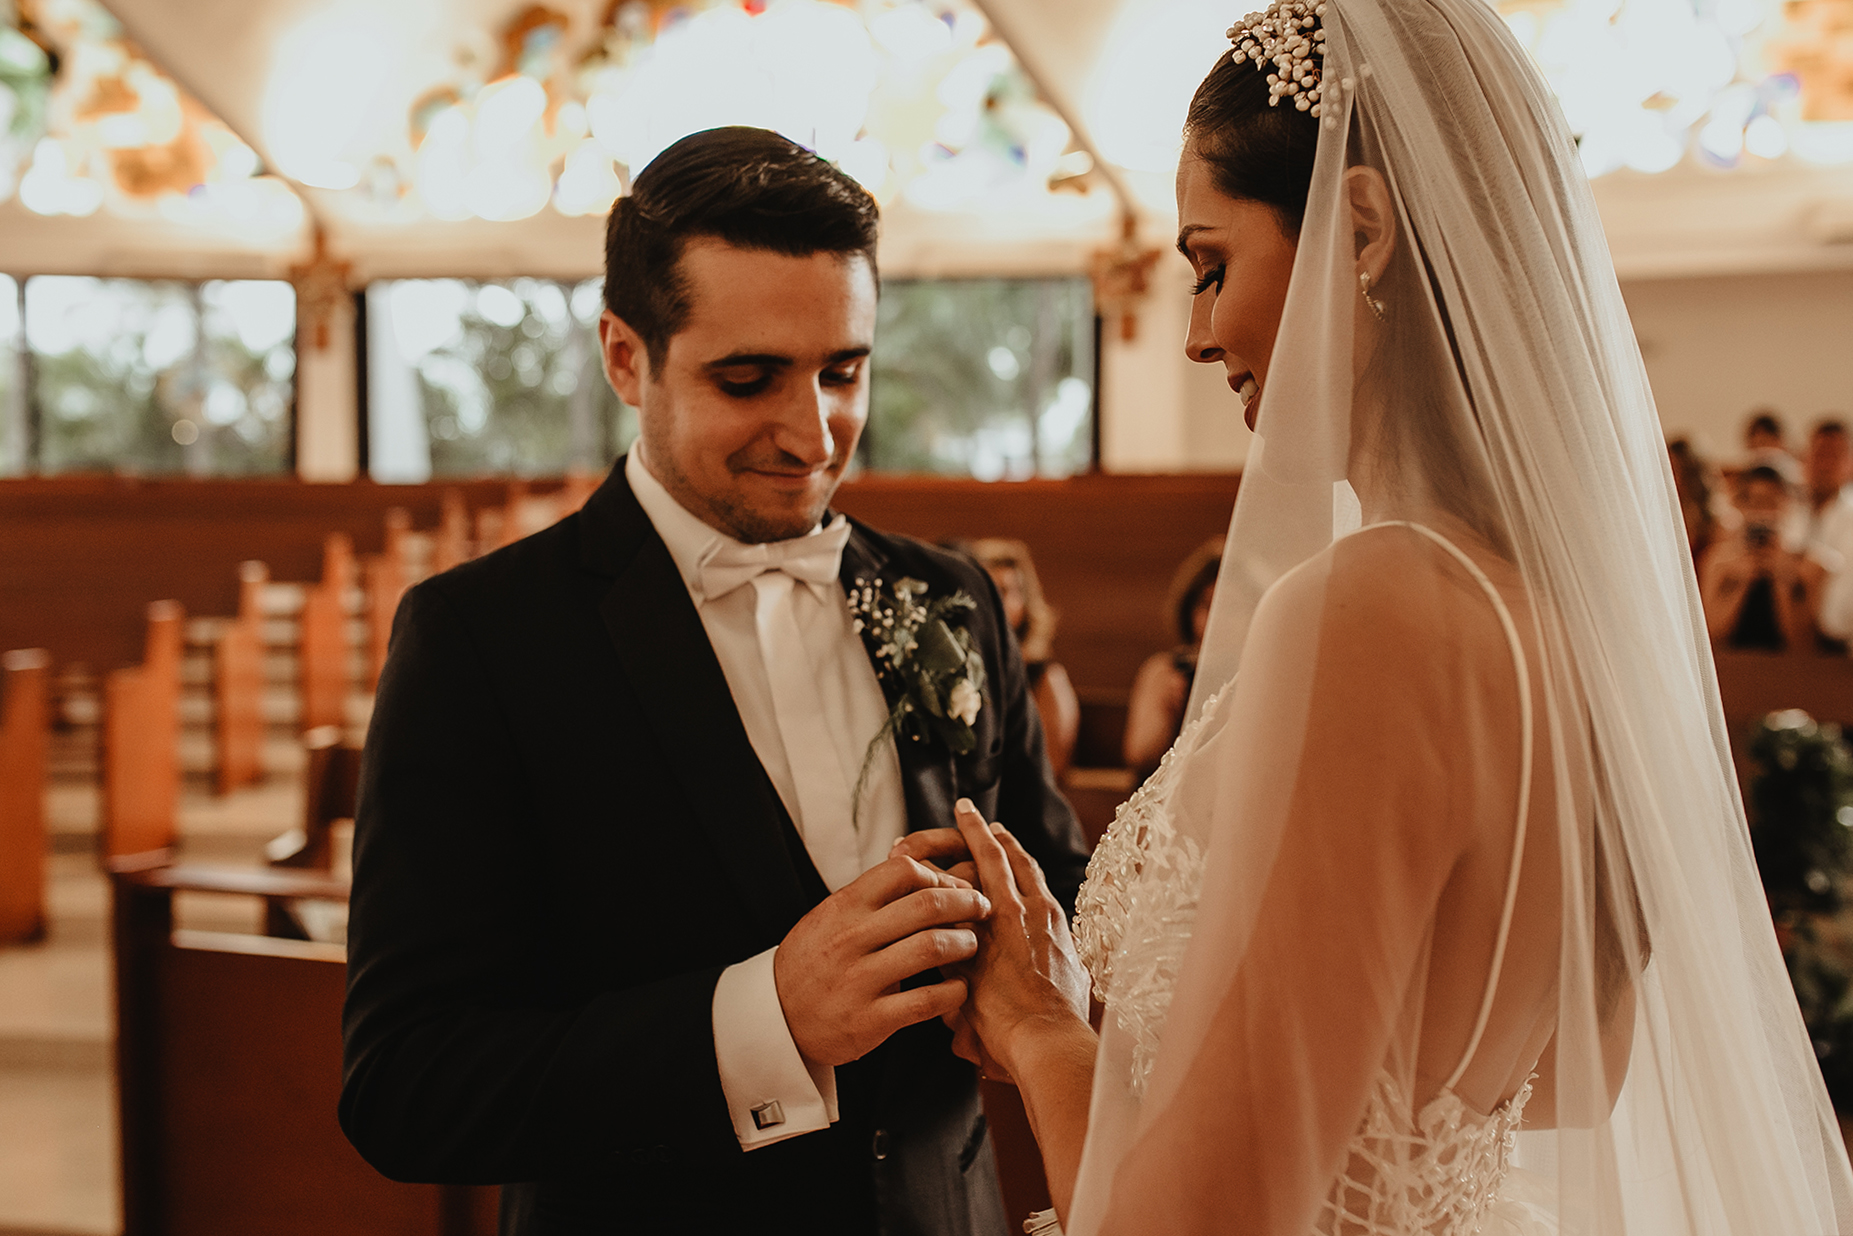 0654R&F__WeddingDestination_Weddingmerida_BodaMexico_FotografoDeBodas_FabrizioSimoneenFotografo.jpg